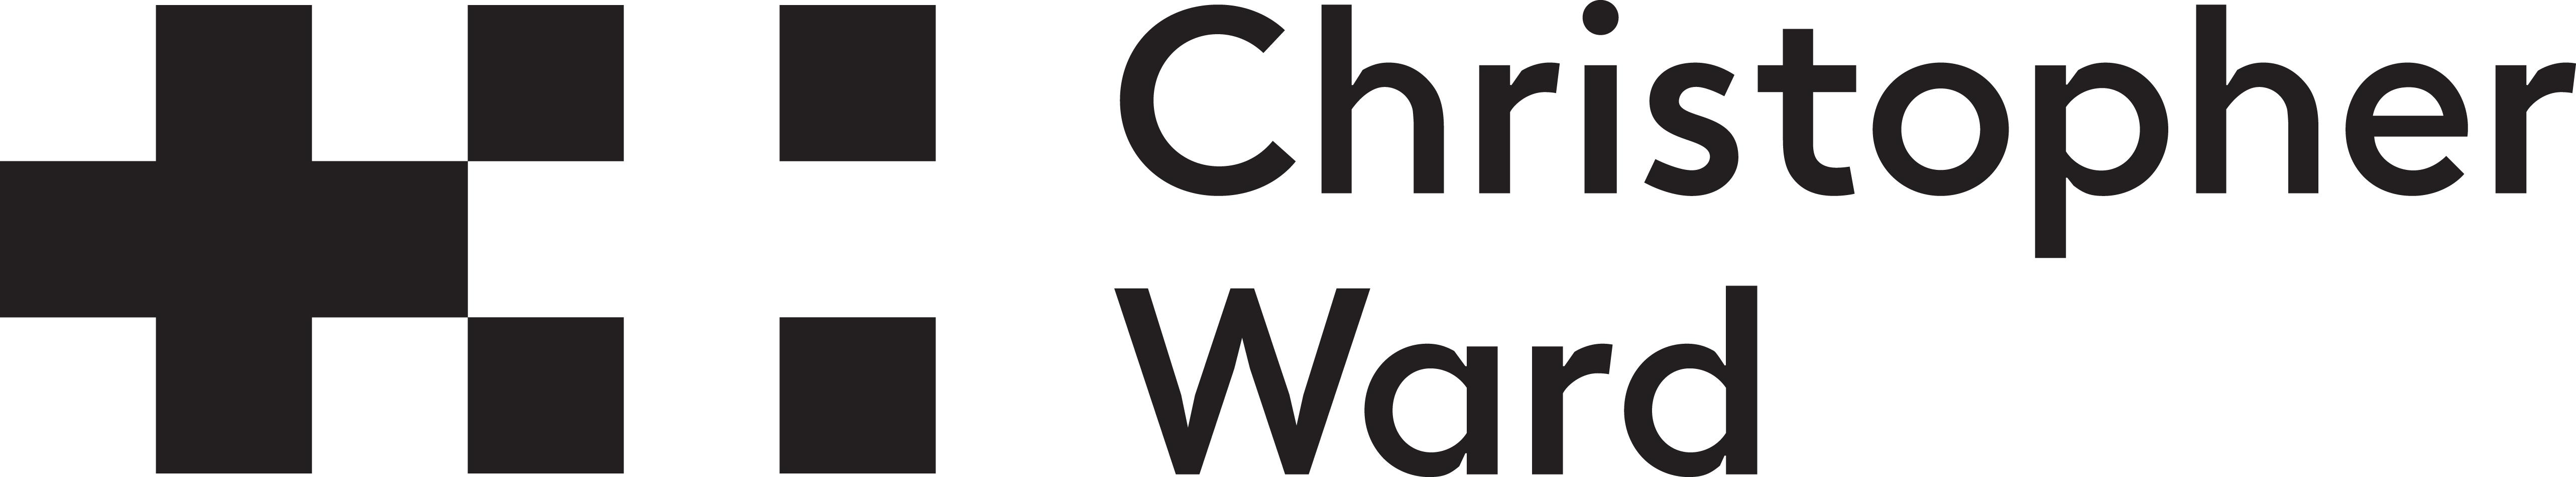 Christopher Ward logo